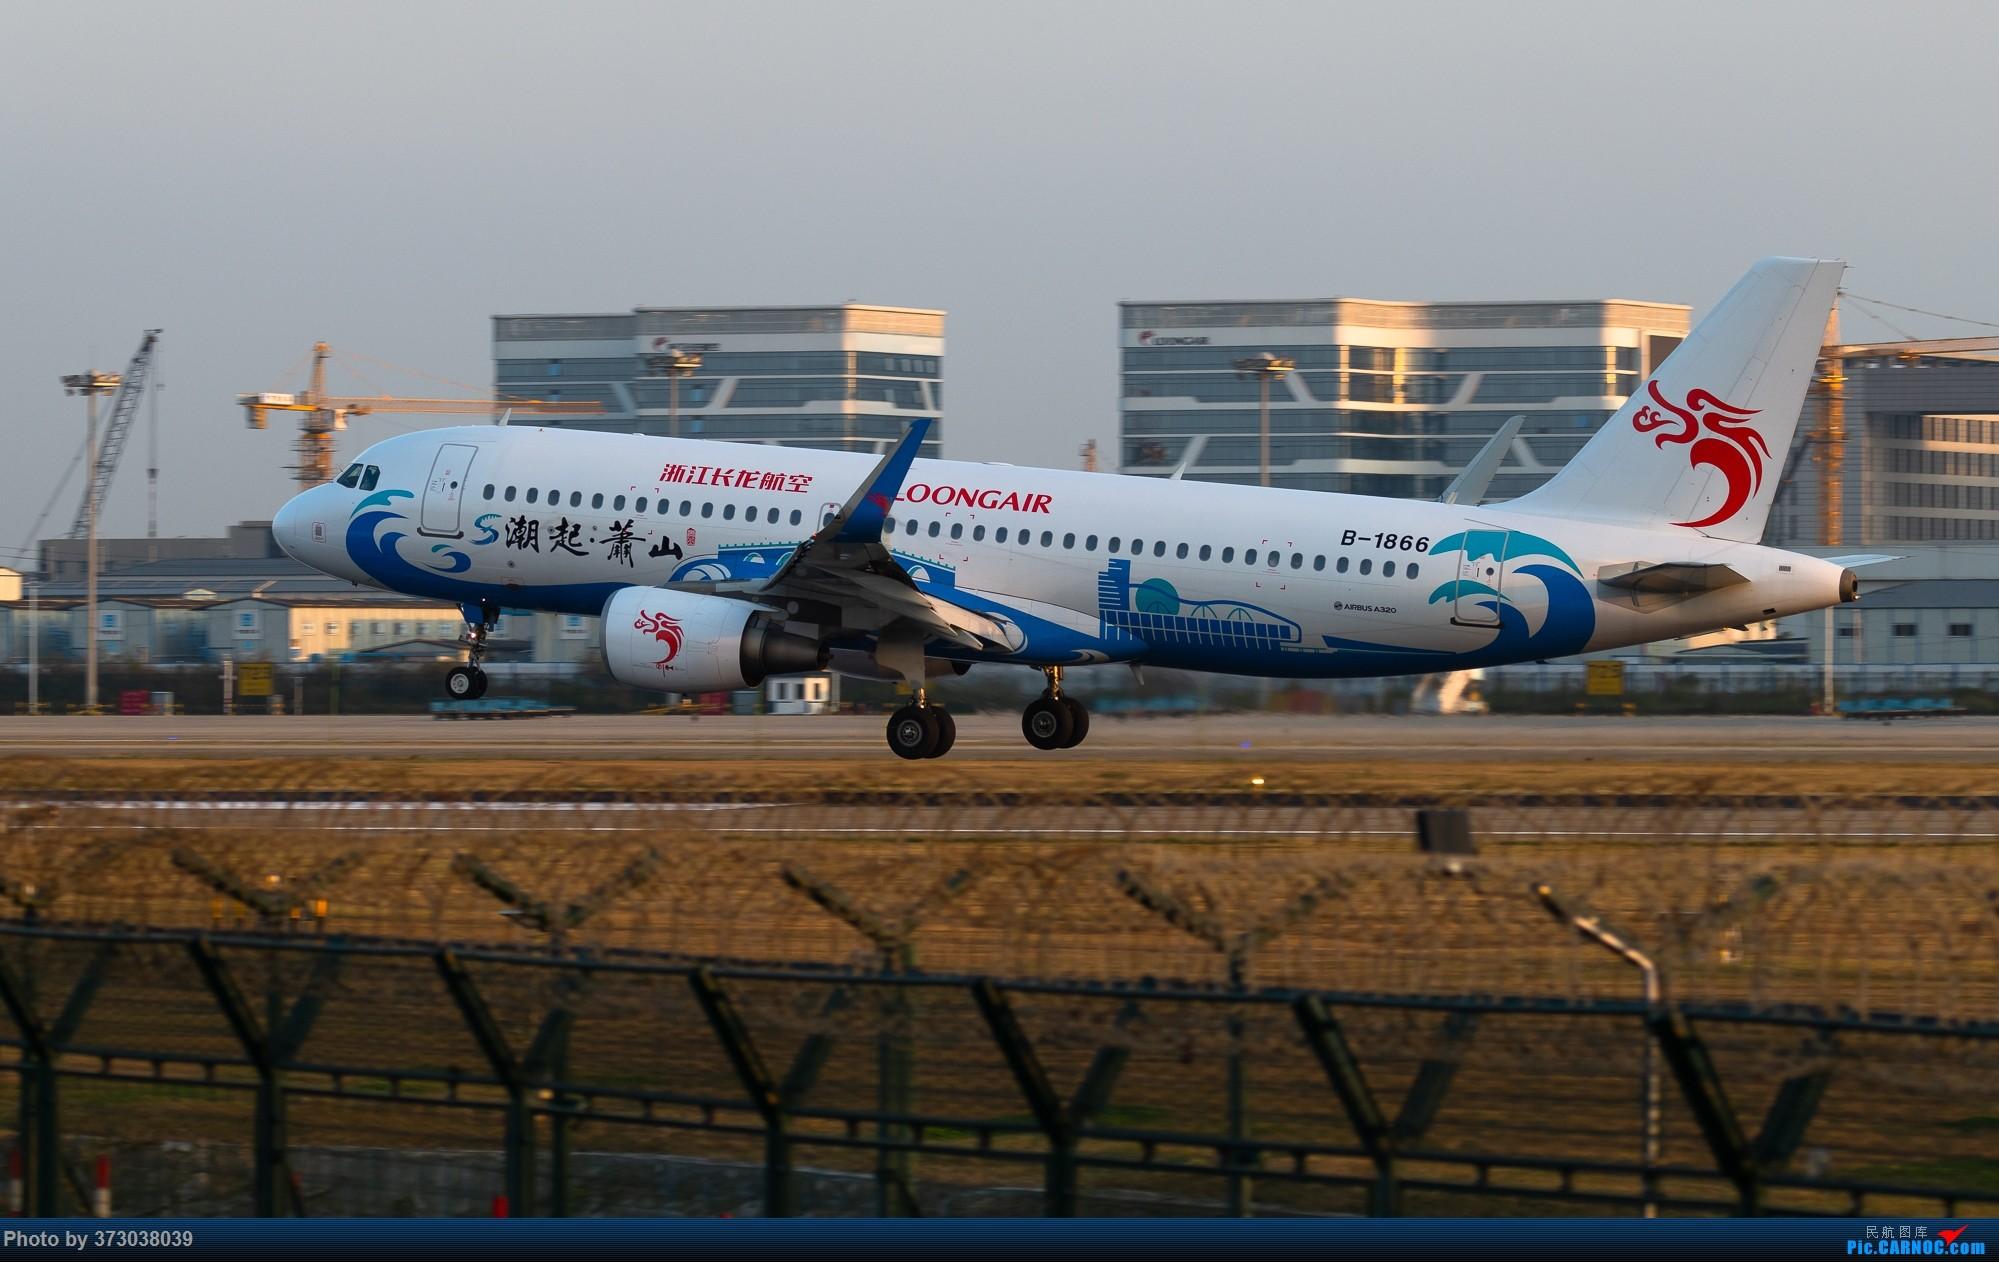 Re:[原创]浙江长龙航空 潮起萧山号彩绘日暮回归 AIRBUS A320-200 B-1866 中国杭州萧山国际机场